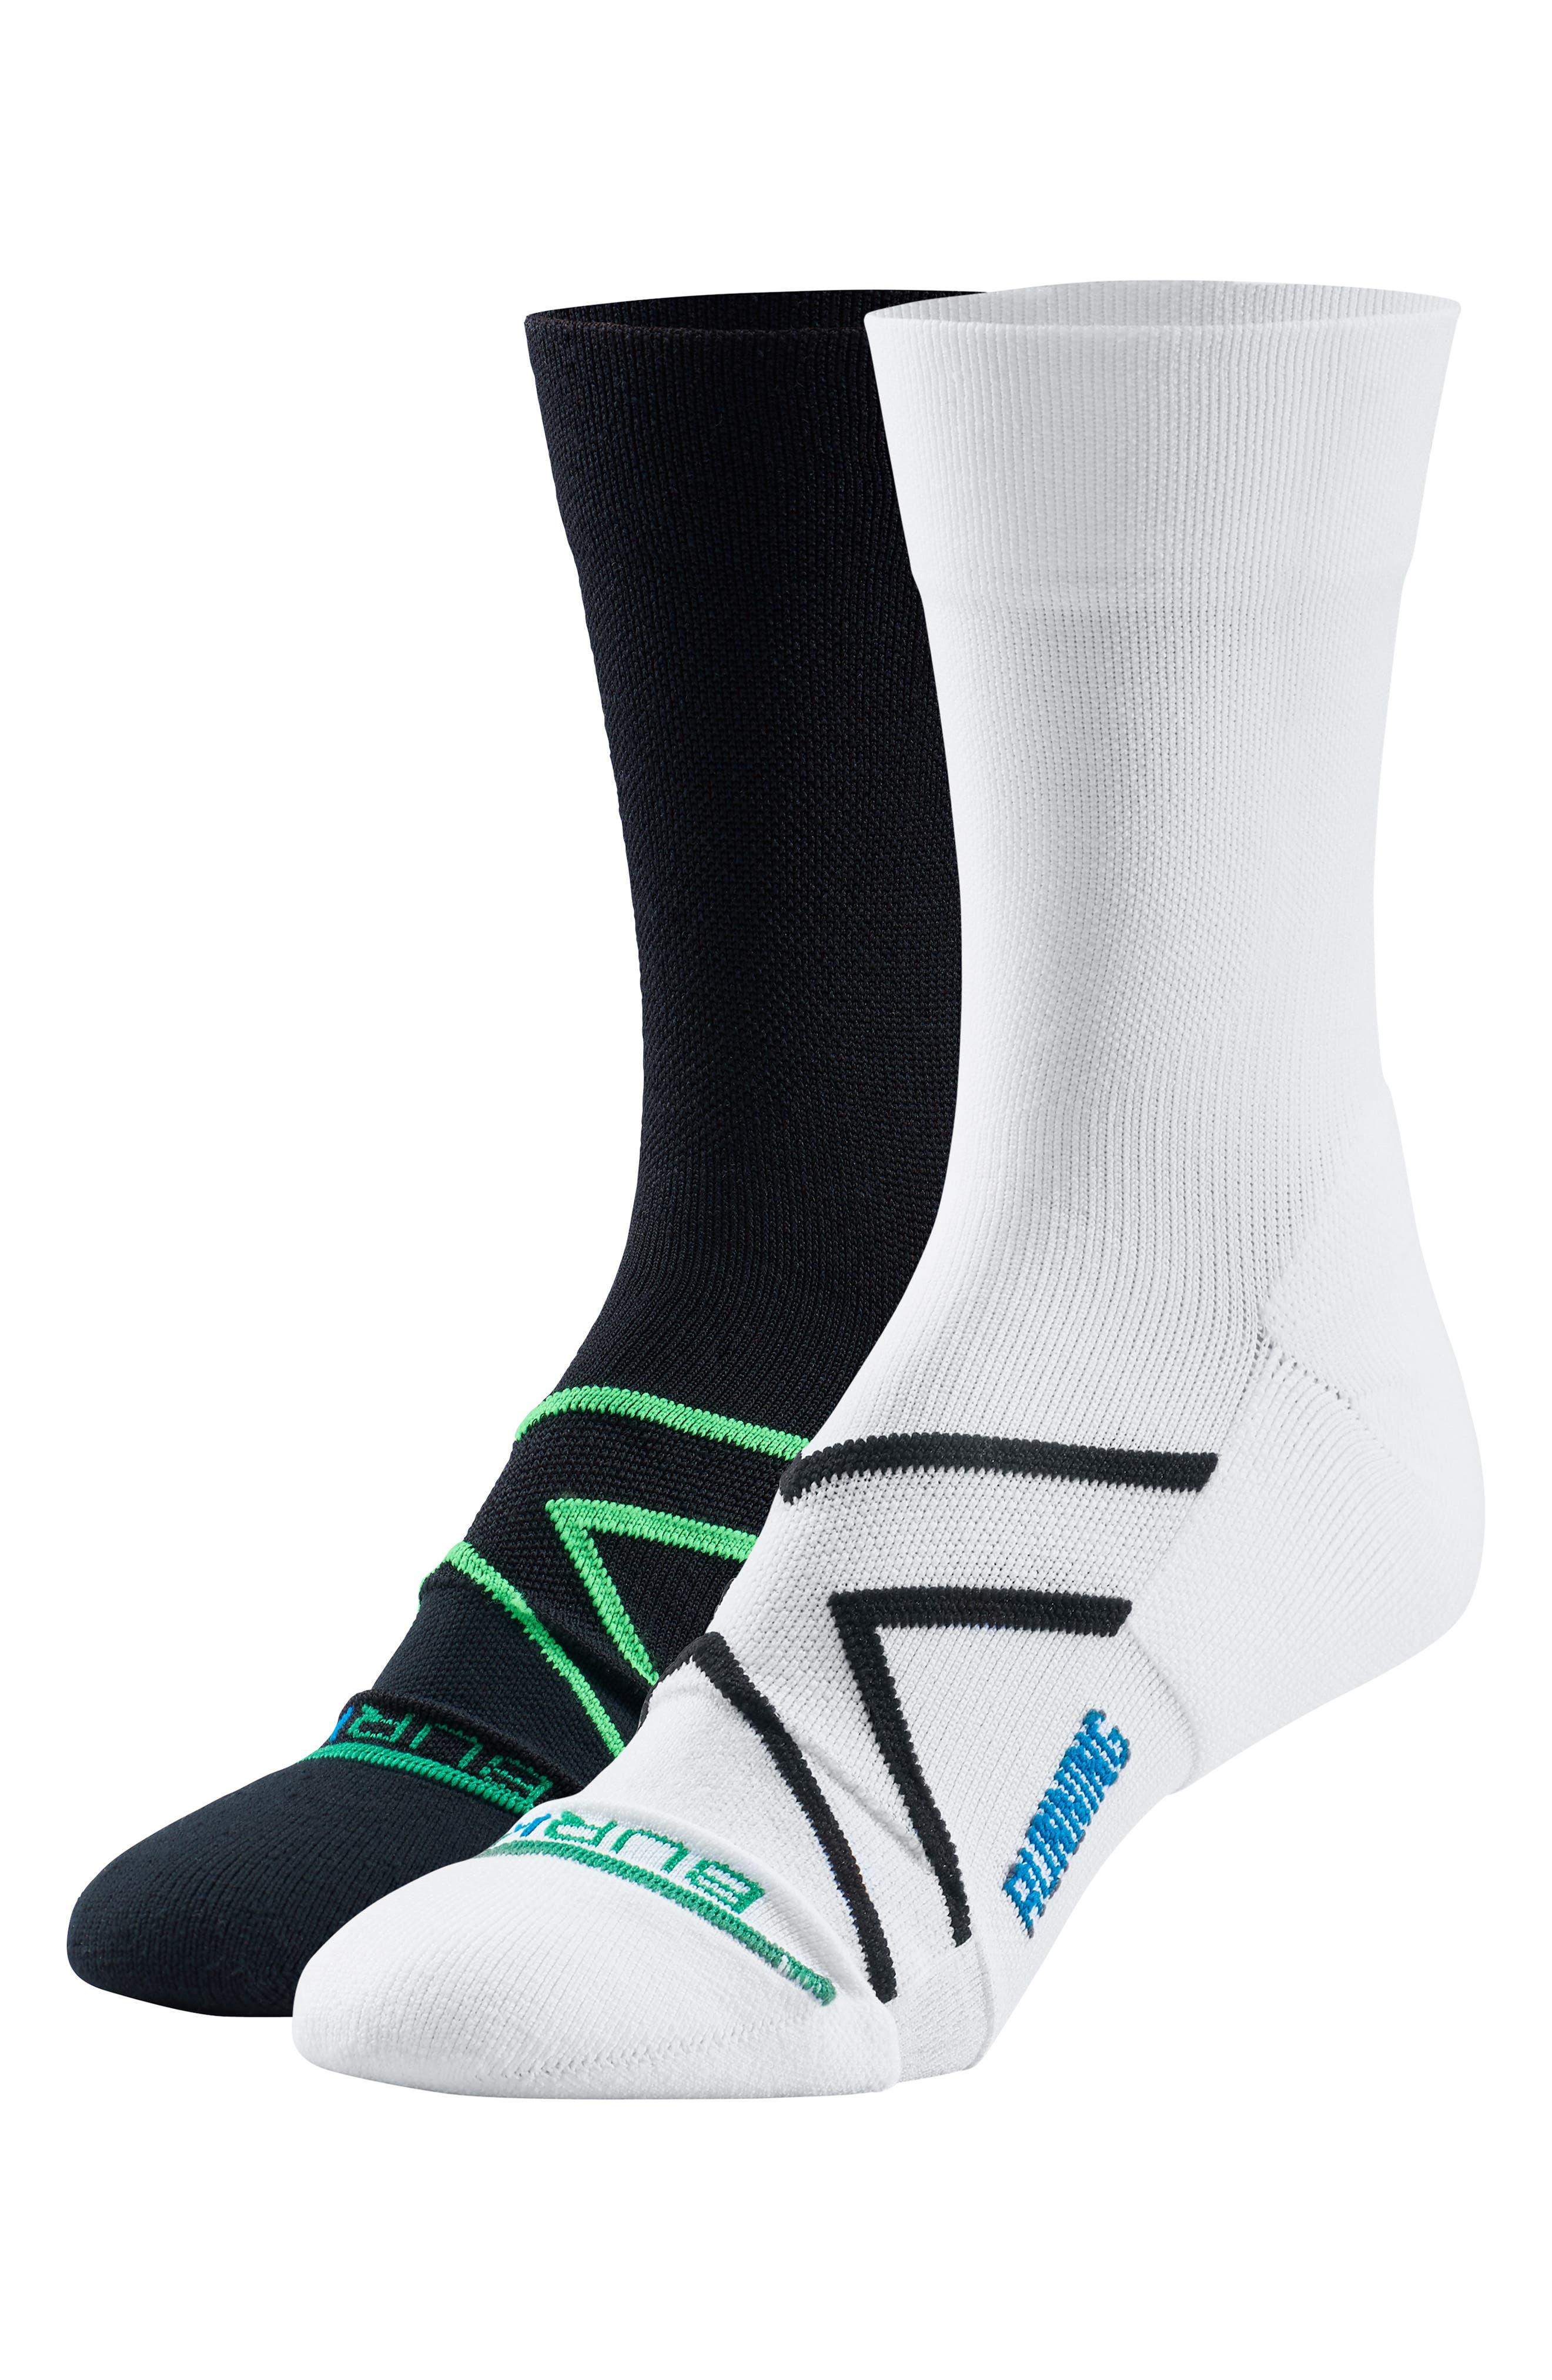 Assorted 2-Pack Sport Running Crew Socks